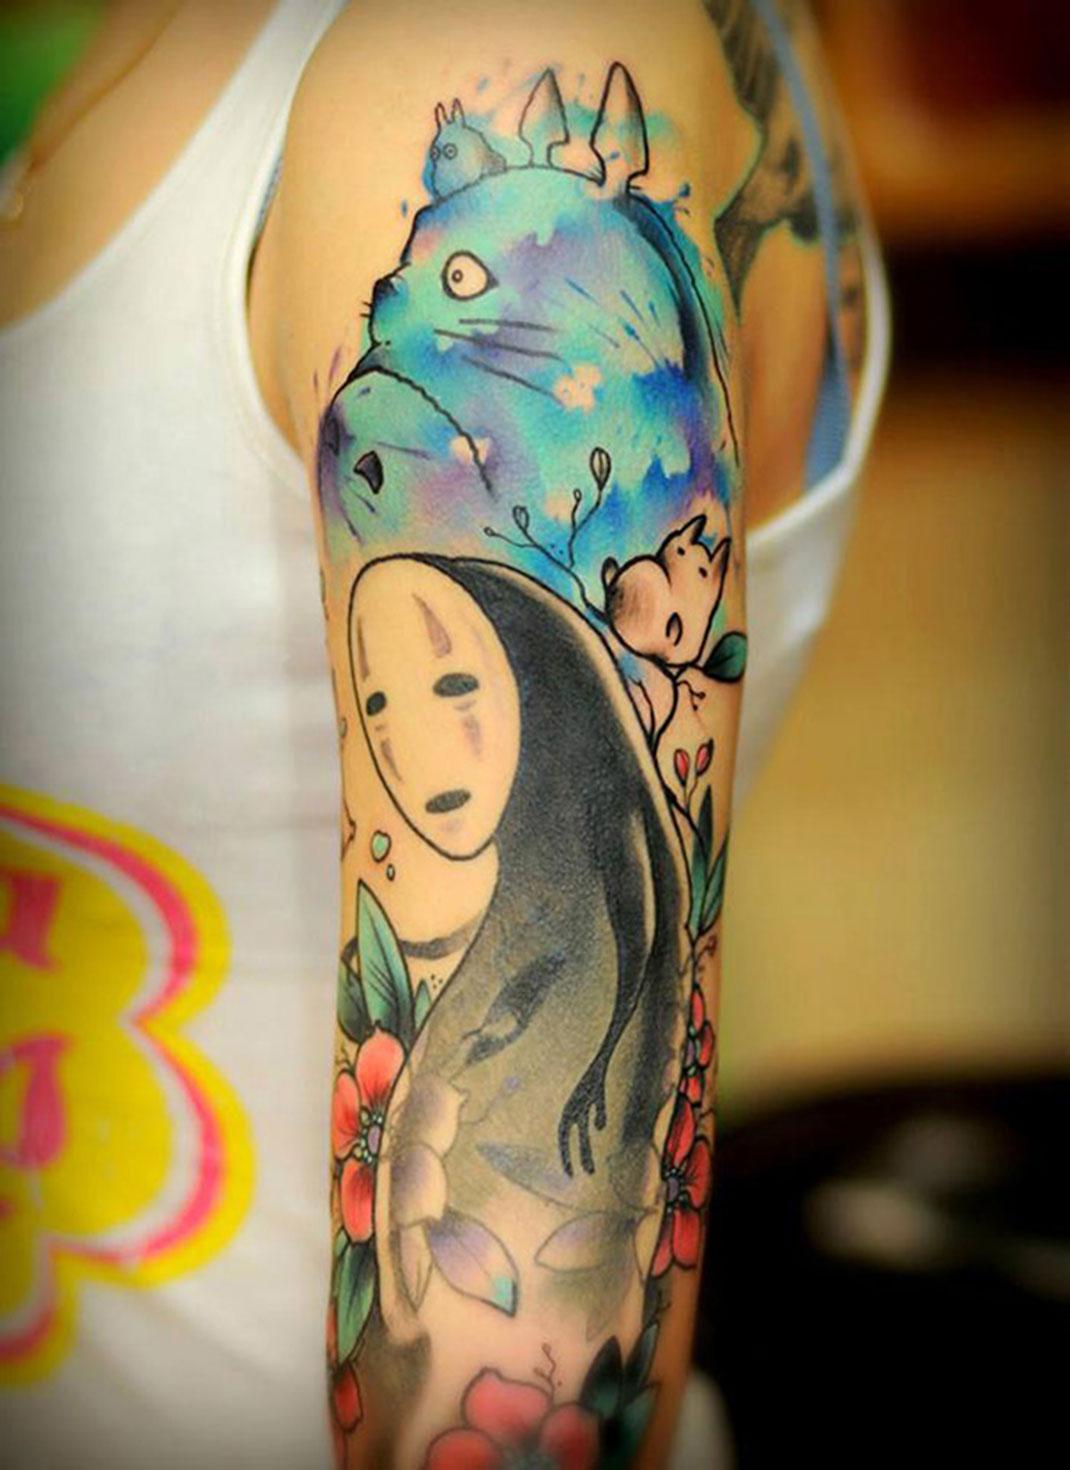 anime-totoro-fan-tattoos-hayao-miyazaki-studio-ghibli-22